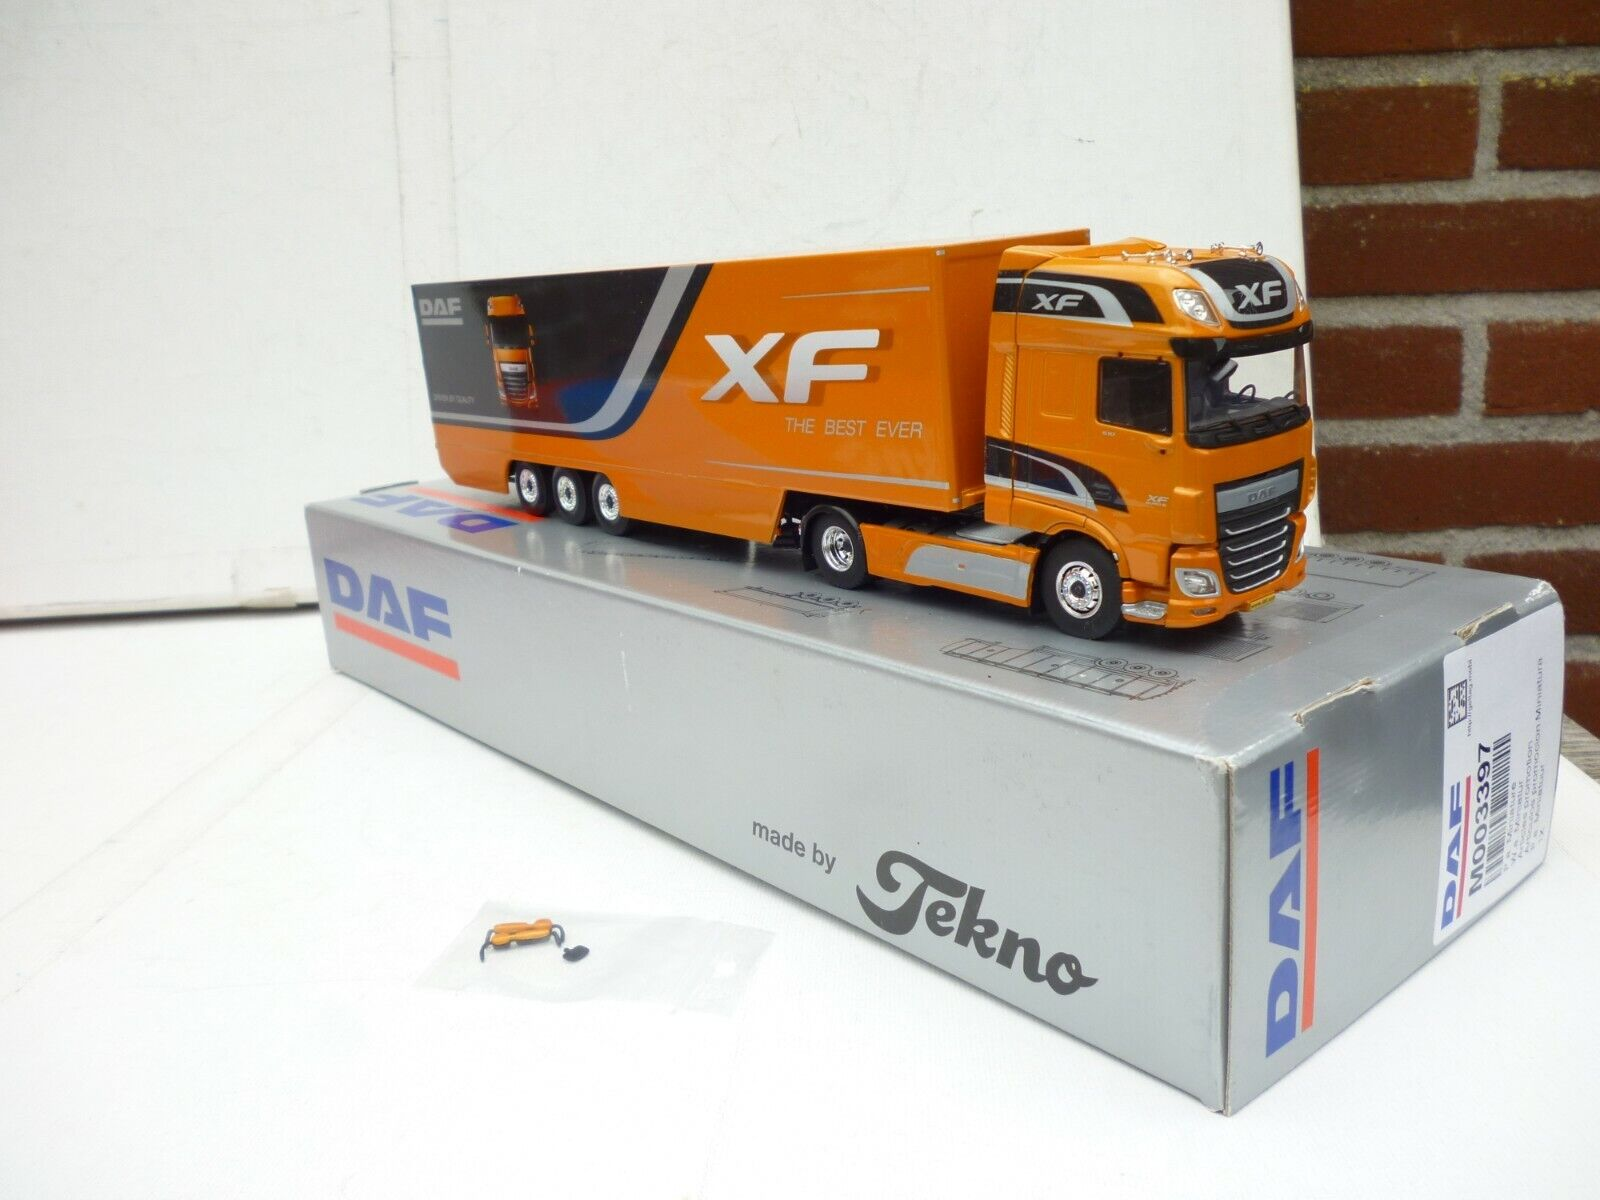 1 50 TEKNO DAF XF PROMO MODEL DAF XF EURO 6 BEST XF EVER MINT BOXED RARE